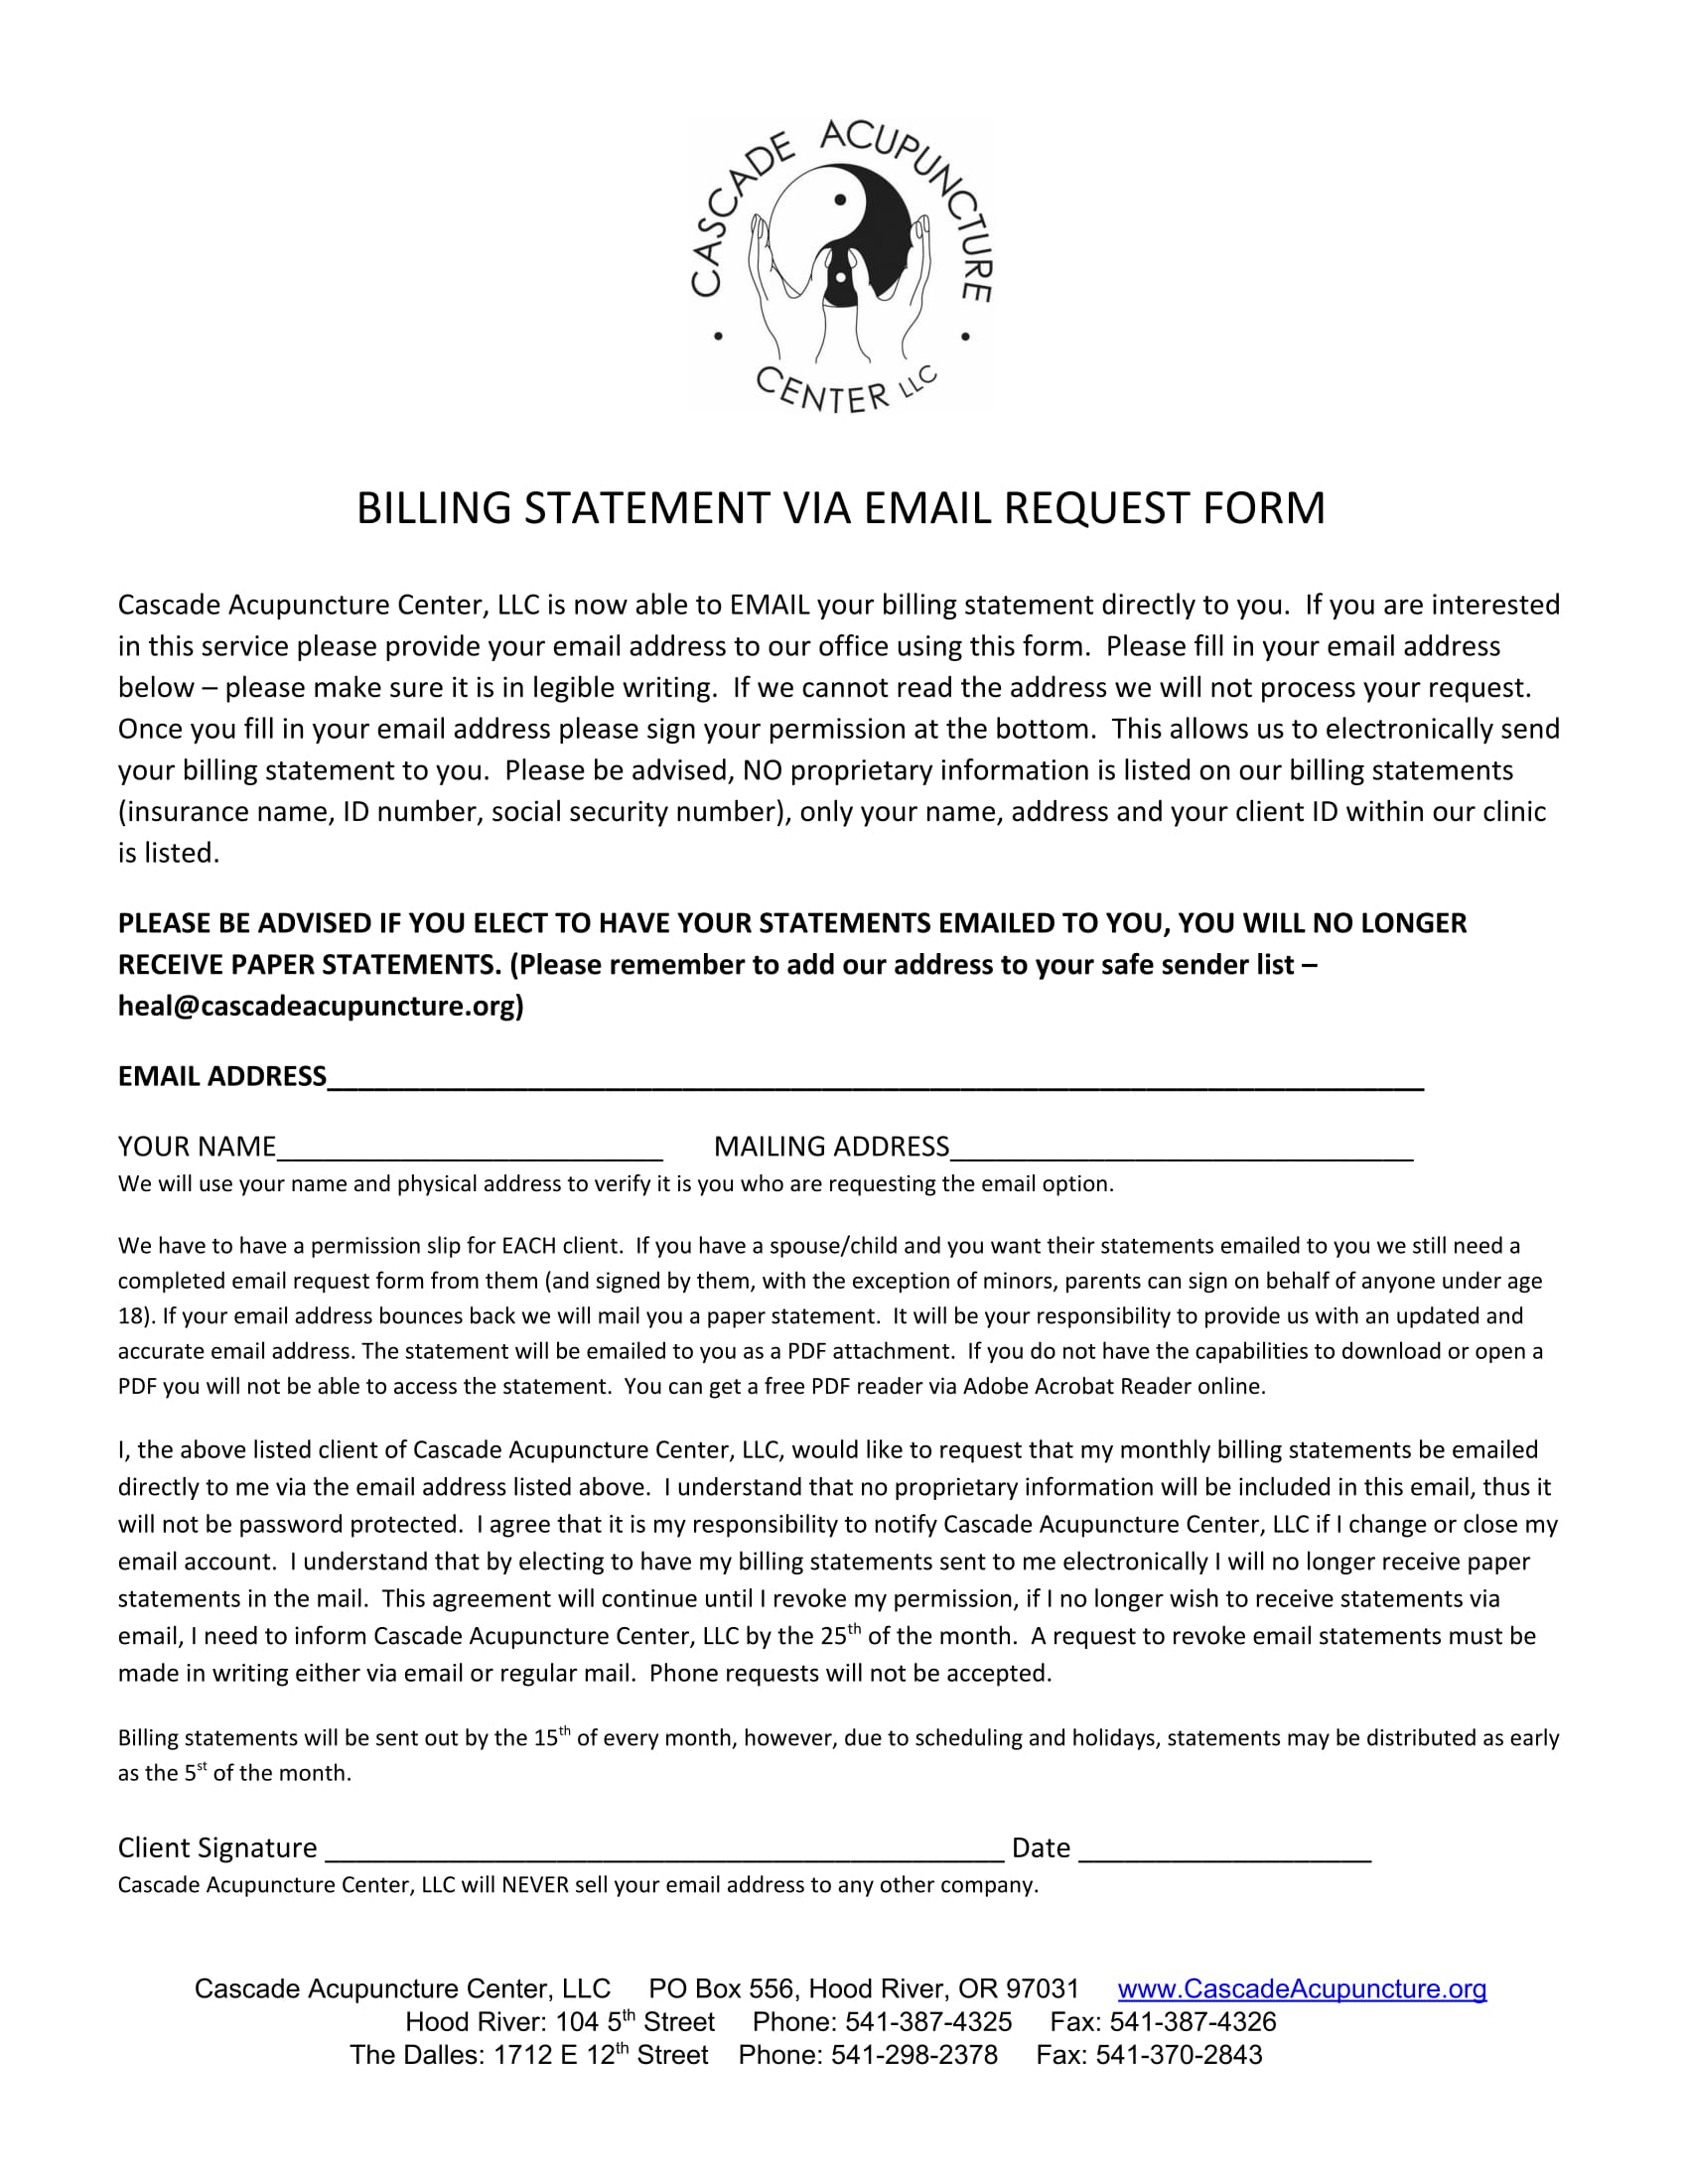 email billing statement request form 1